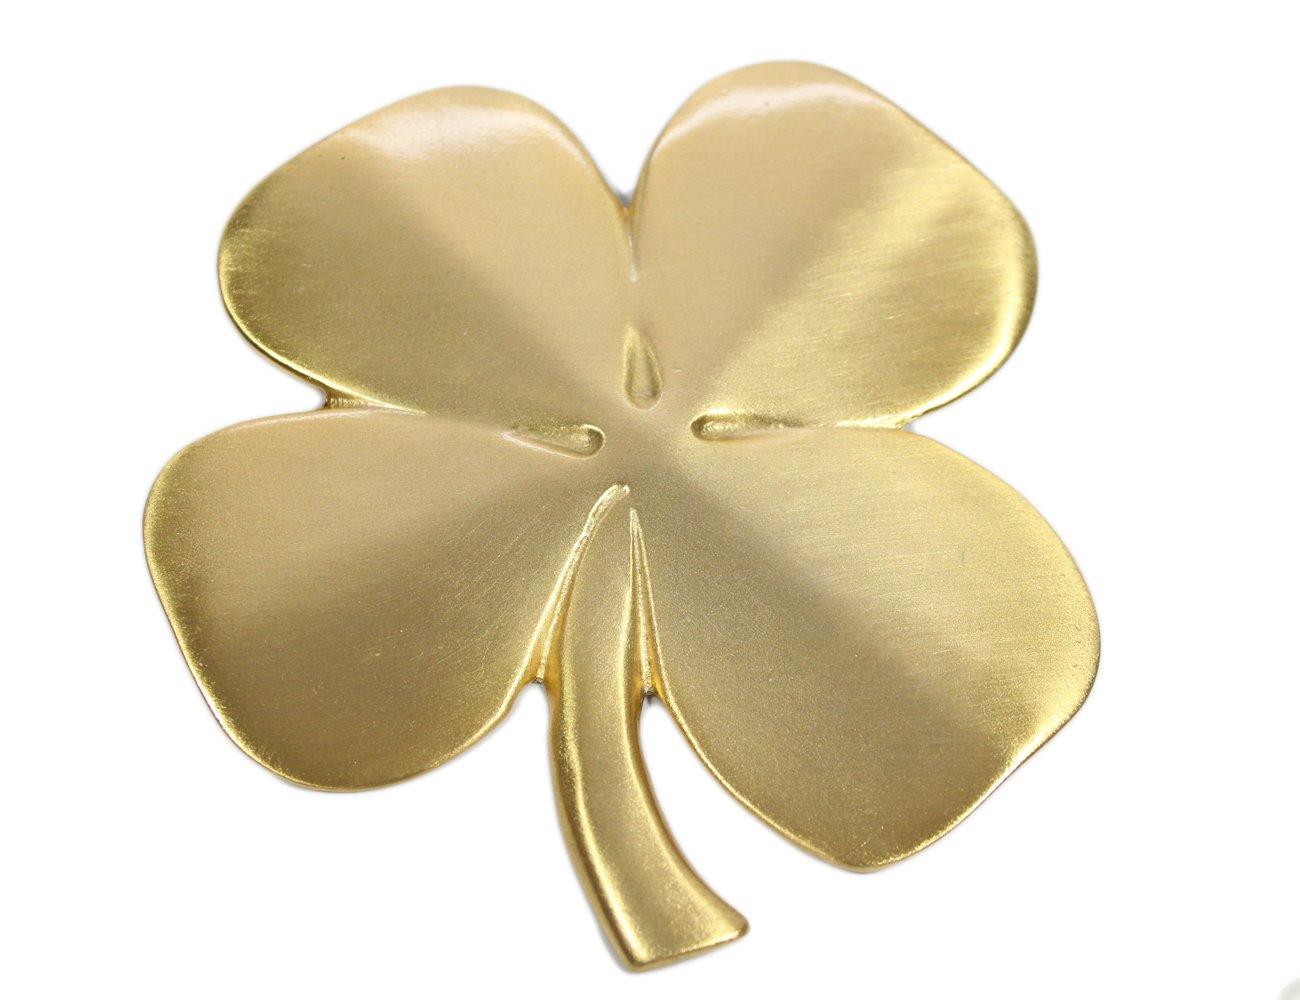 Robert Emmet Co. Lucky 4 Leaf Clover Ireland Wall Hanging Gold Lucky Shamrock Plated Pewter Irish Blessing Wall Decor